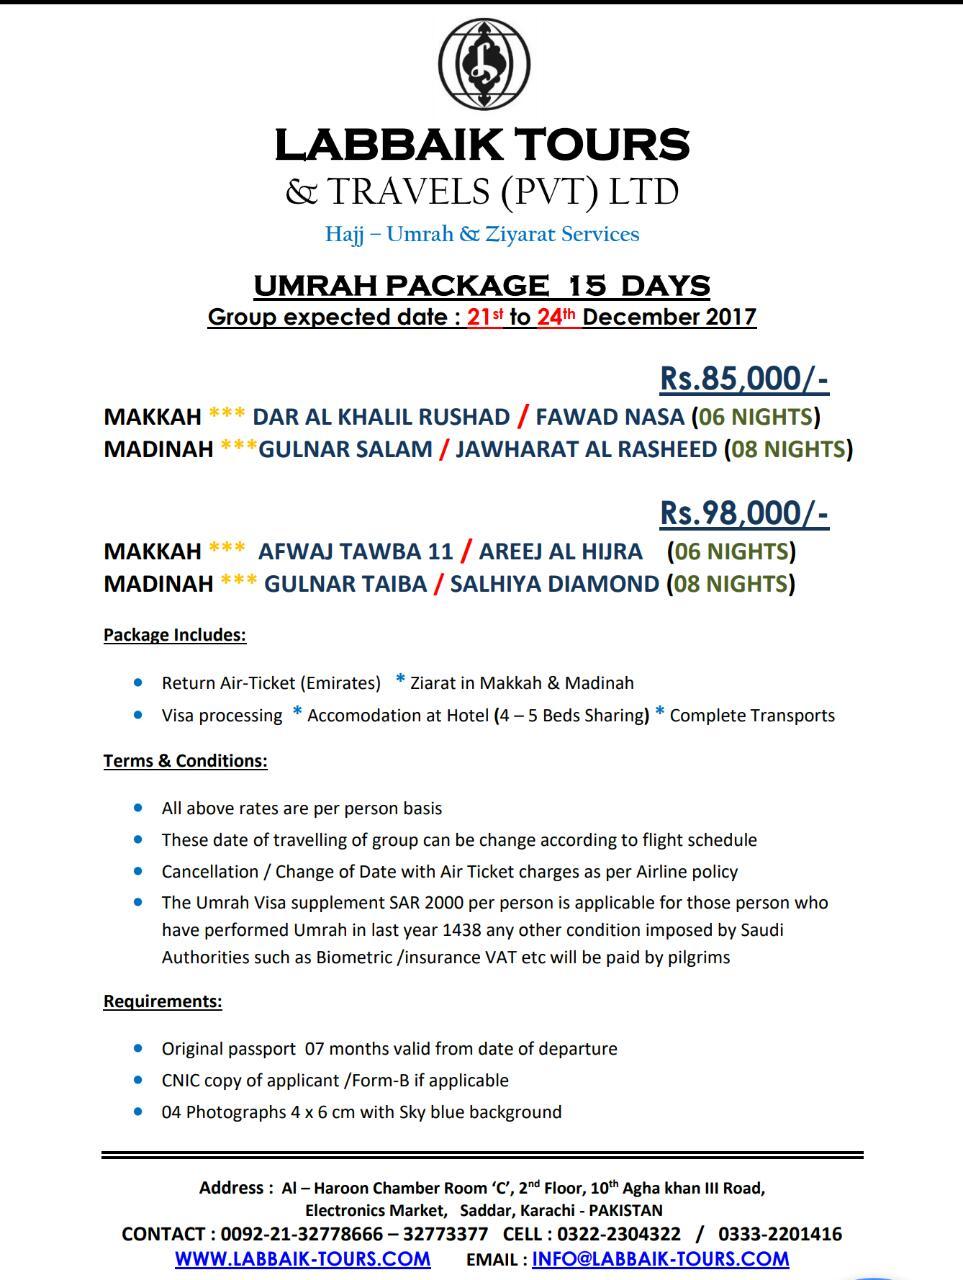 Ramzan umrah package 2018   Labbaik Tours & Travels (Pvt ) Ltd